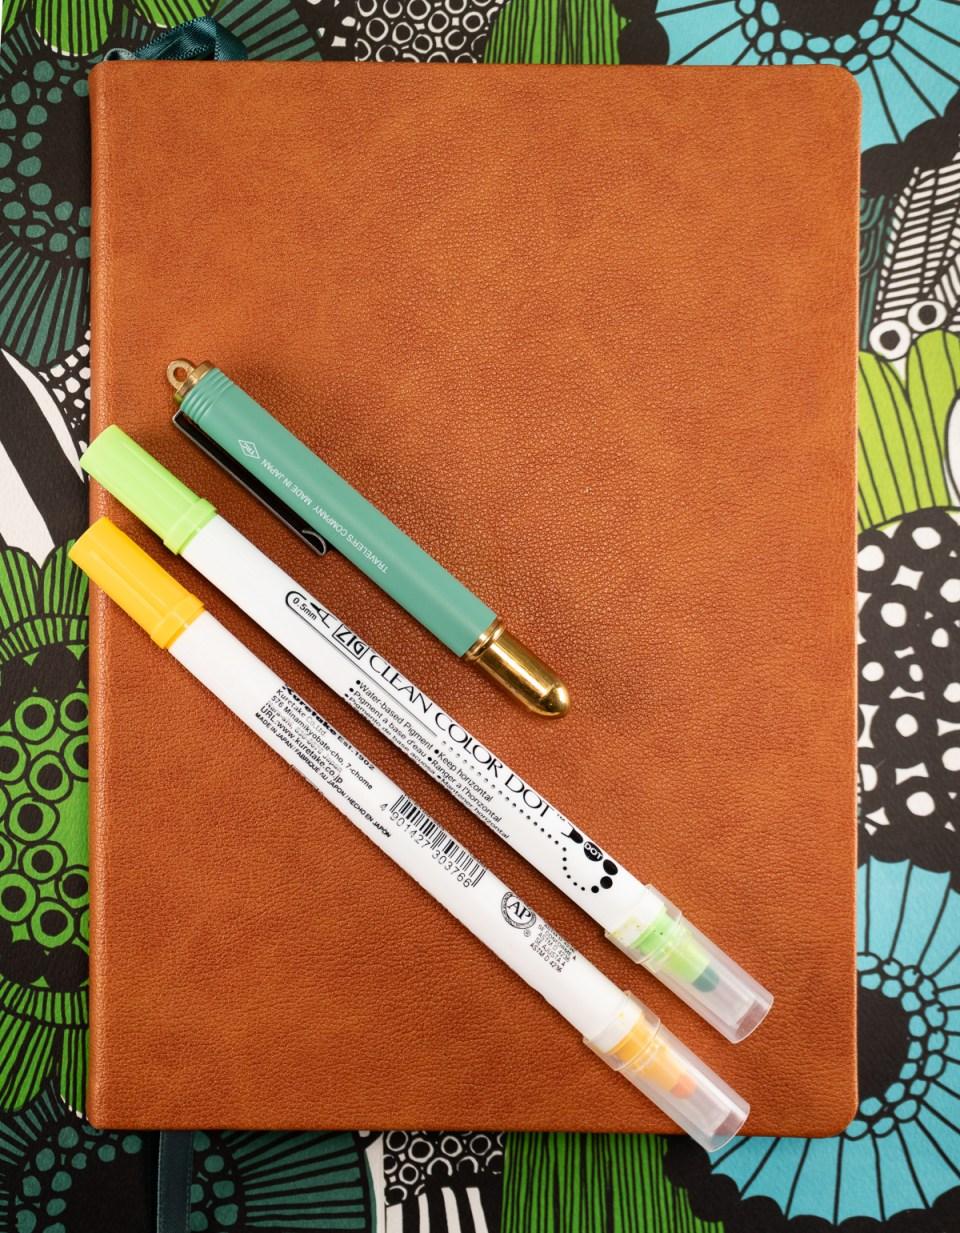 Planner Review: Erin Condren Focused Productivity Planner